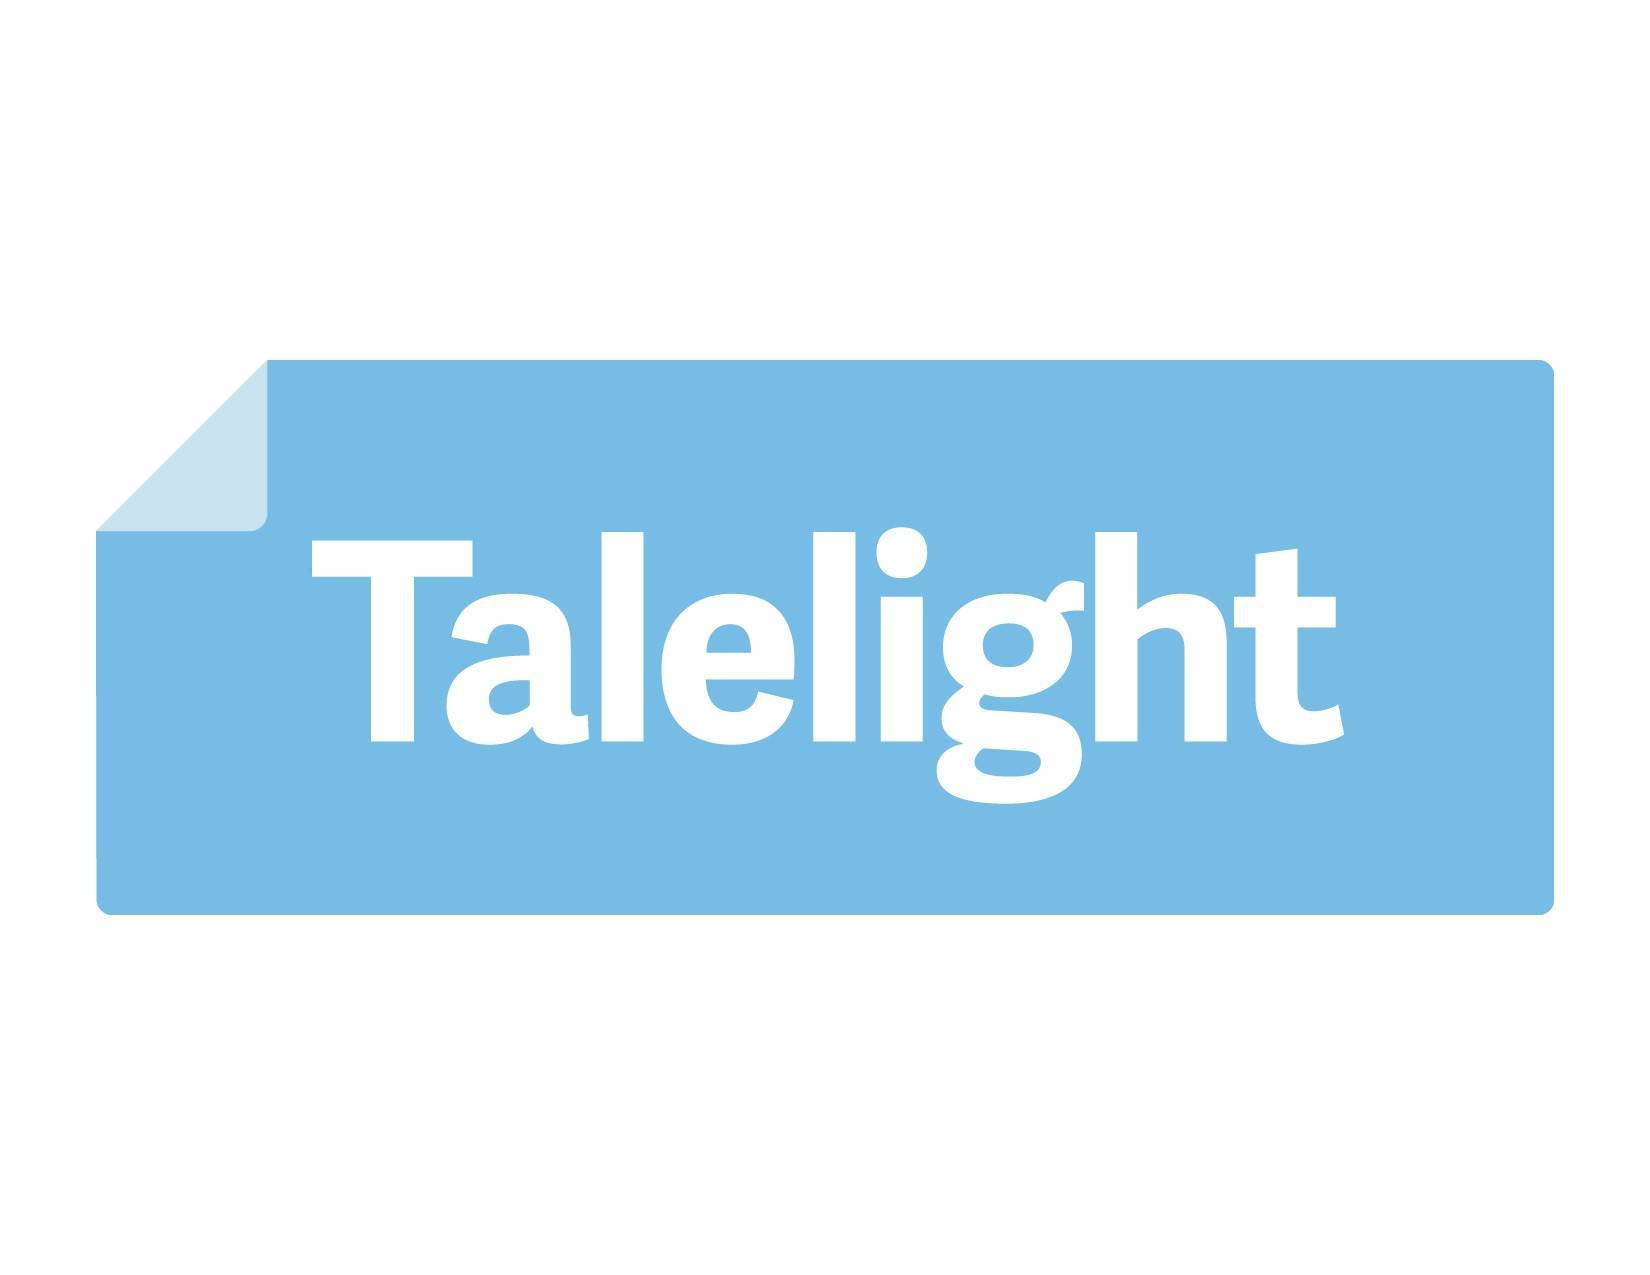 e1b63b58e044a353138f_Talelight-Flat_Logo1.jpg